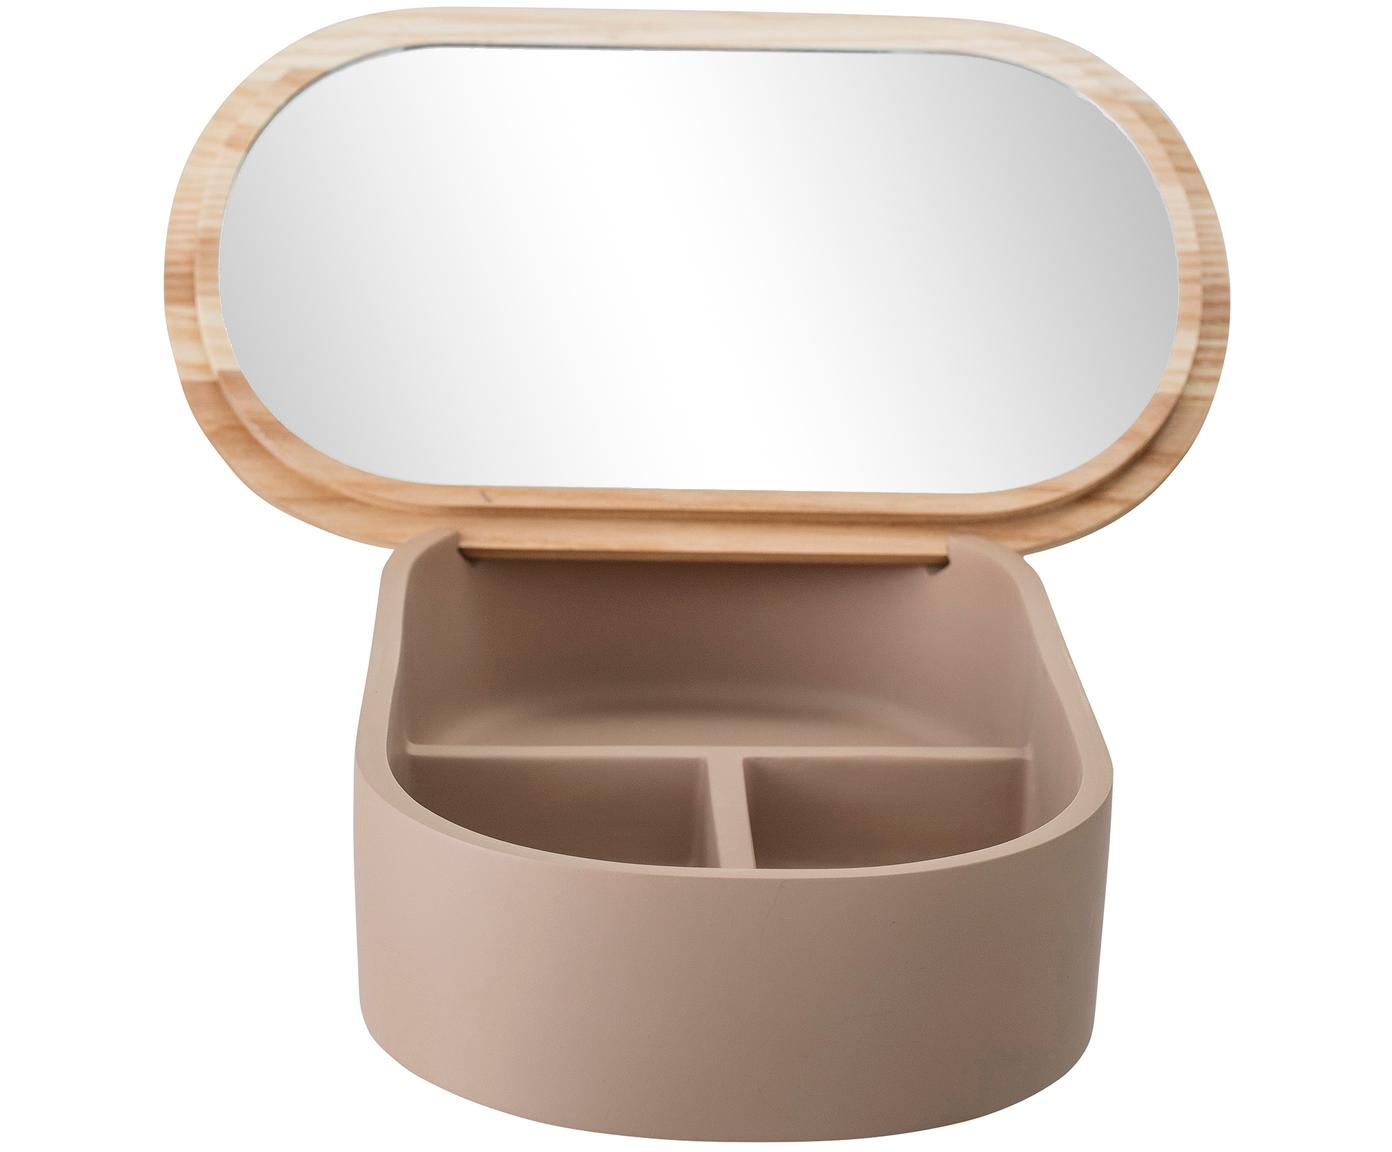 Joyero Noah, Caja: poliresina, Tapa: madera de fresno, Tapa interior: espejo de cristal, Rosa palo, madera de fresno, espejo de cristal, An 23 x Al 6 cm